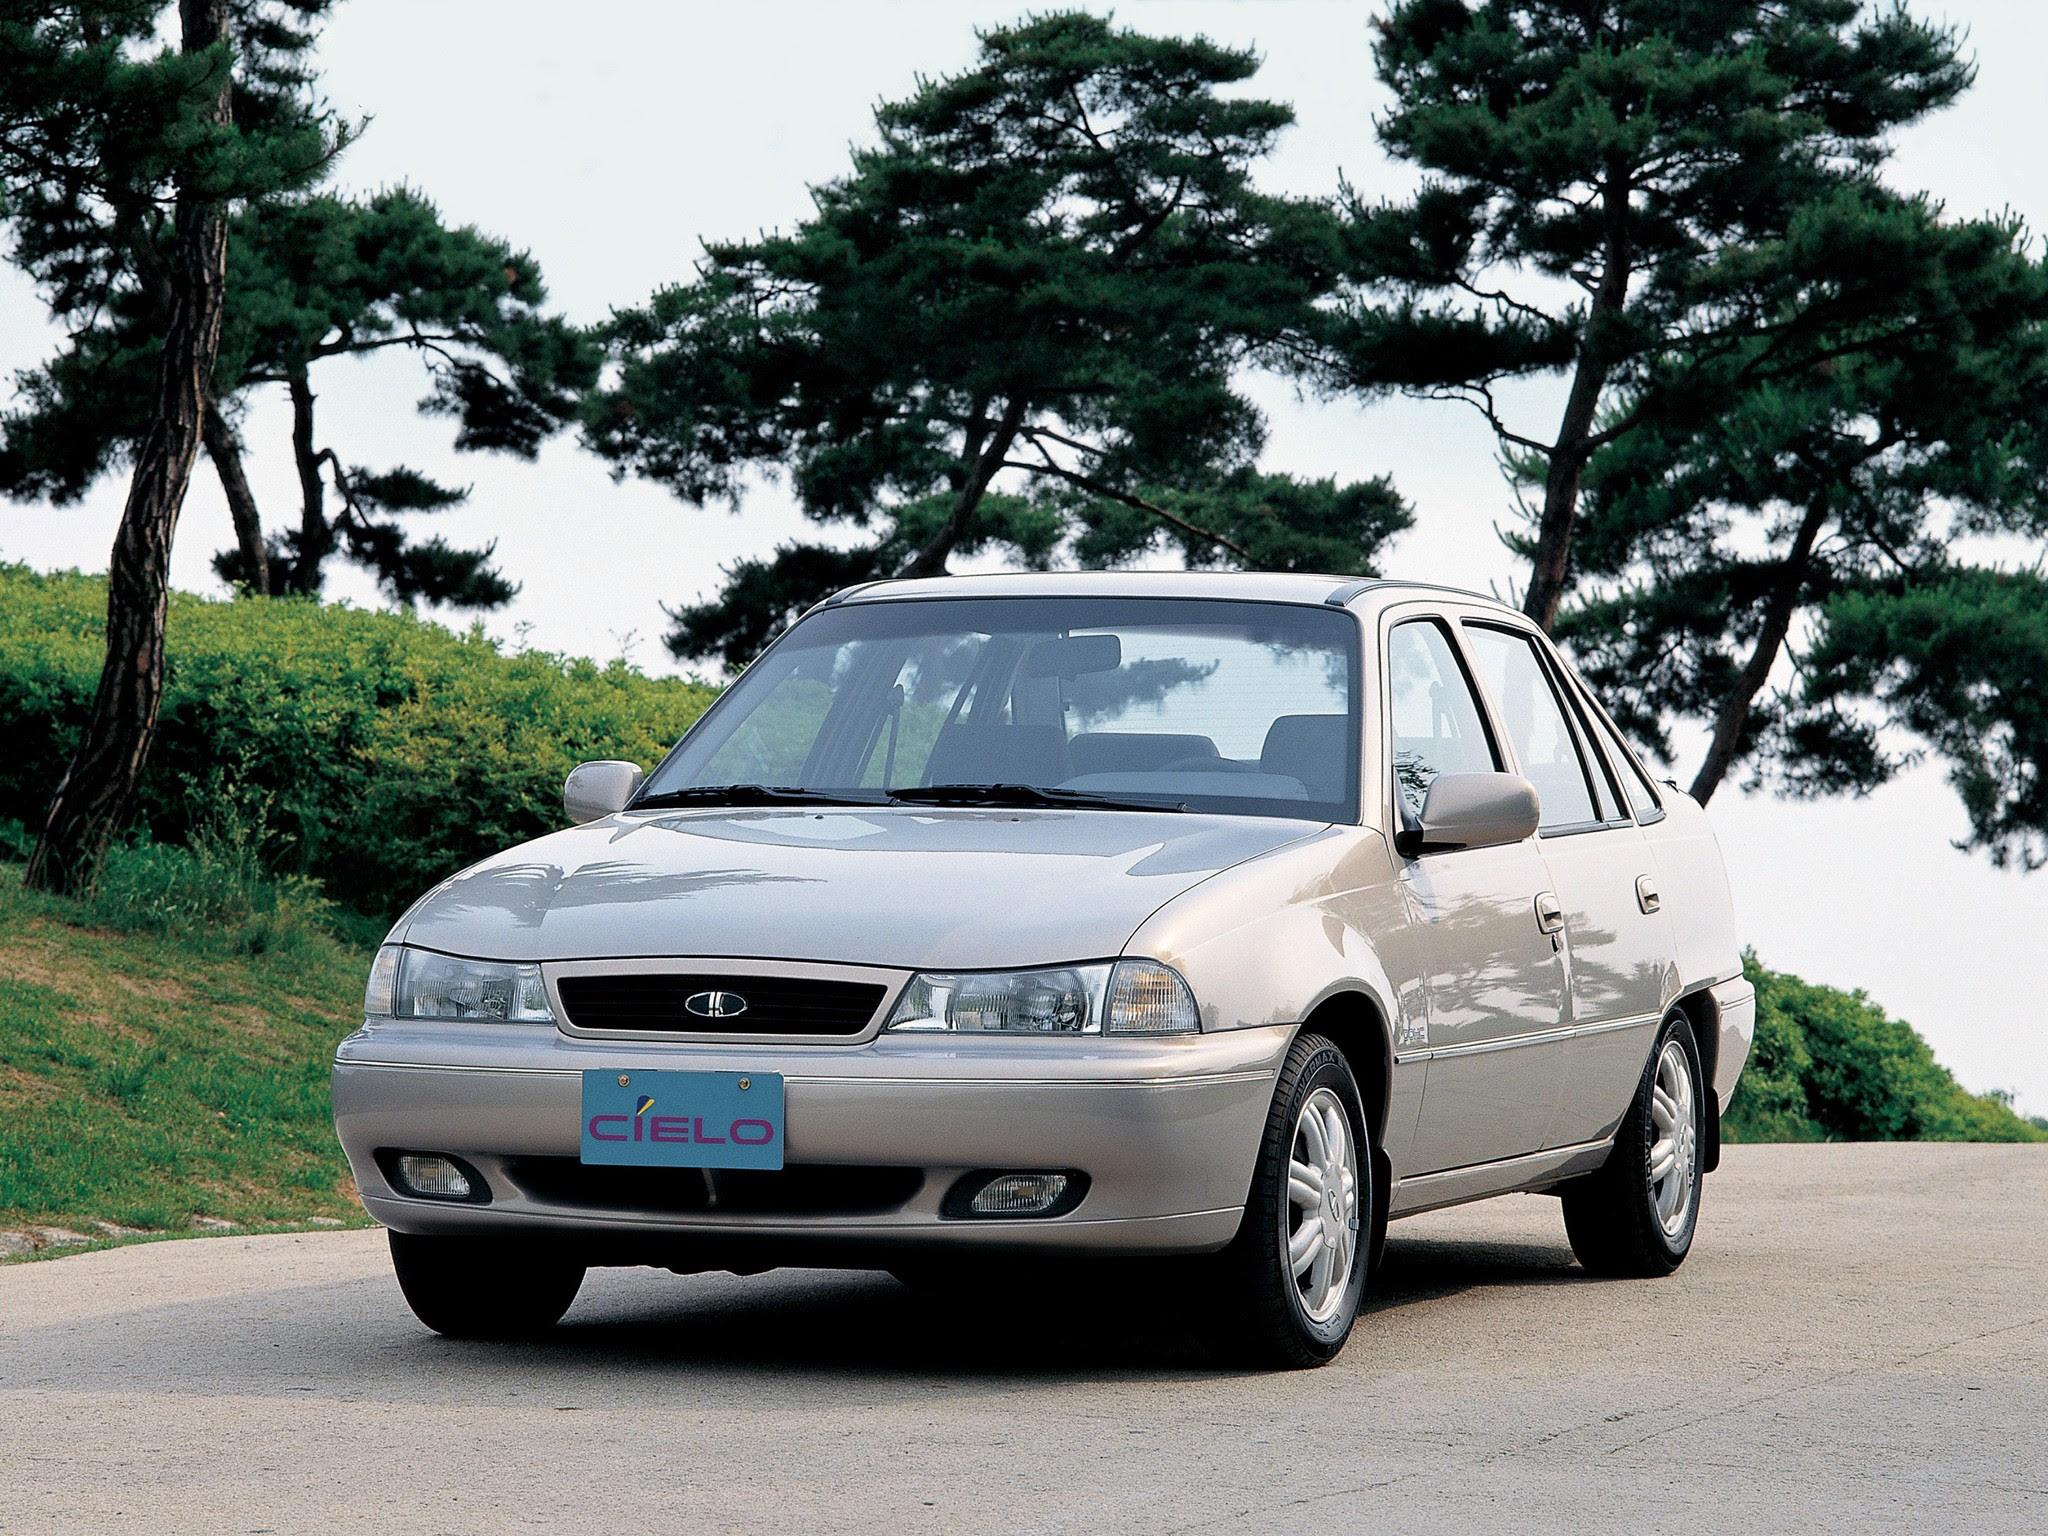 DAEWOO Cielo/Nexia - 1994, 1995, 1996, 1997 - autoevolution